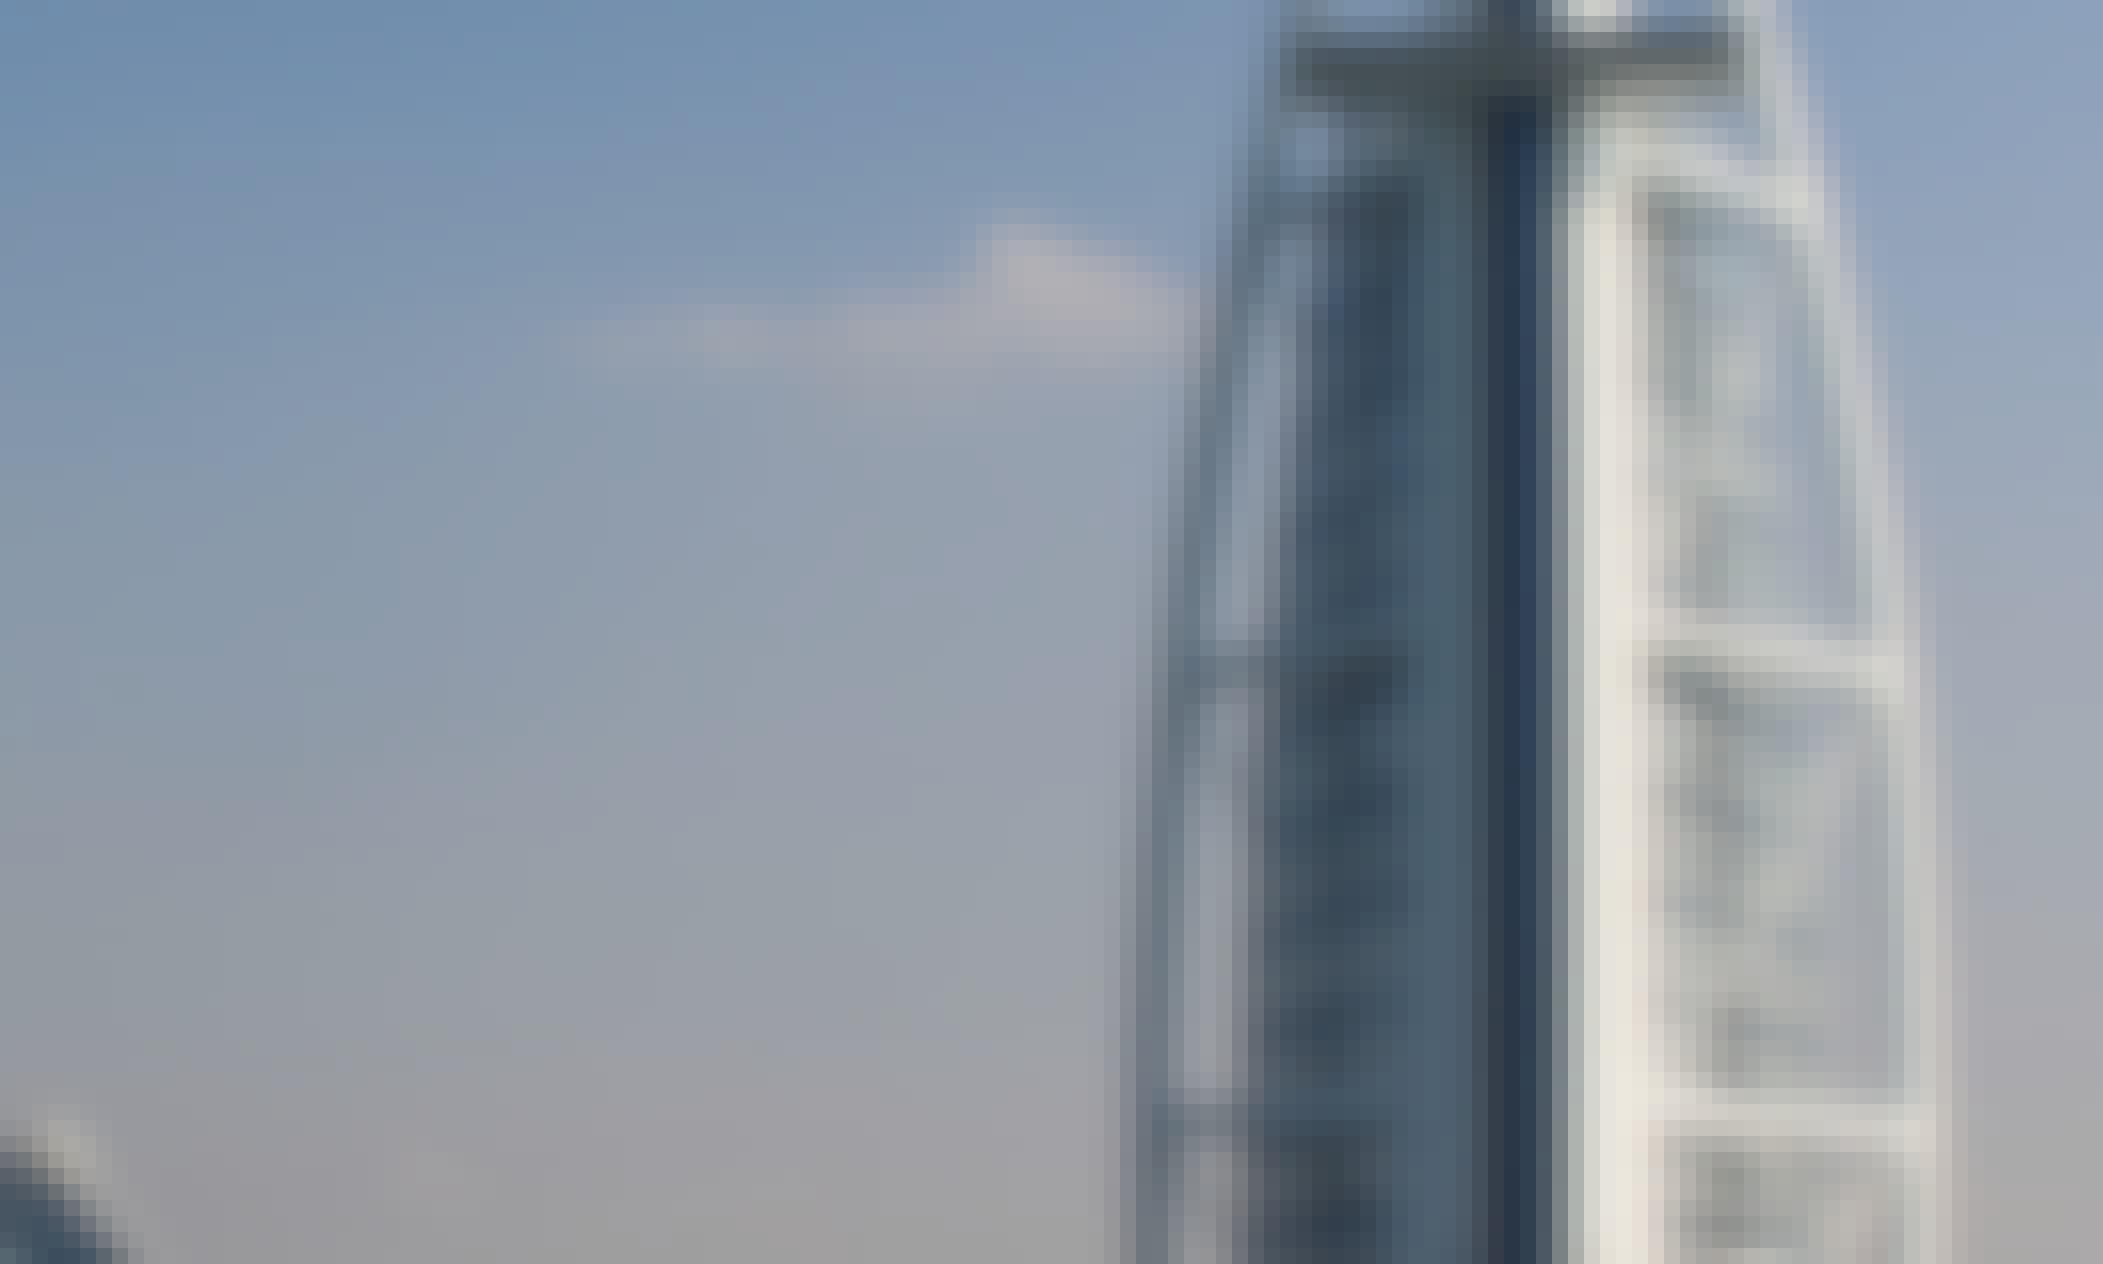 90 Minutes Speedboat Tour around Dubai Marina, Atlantis and Burj Al Arab with complimentary drinks